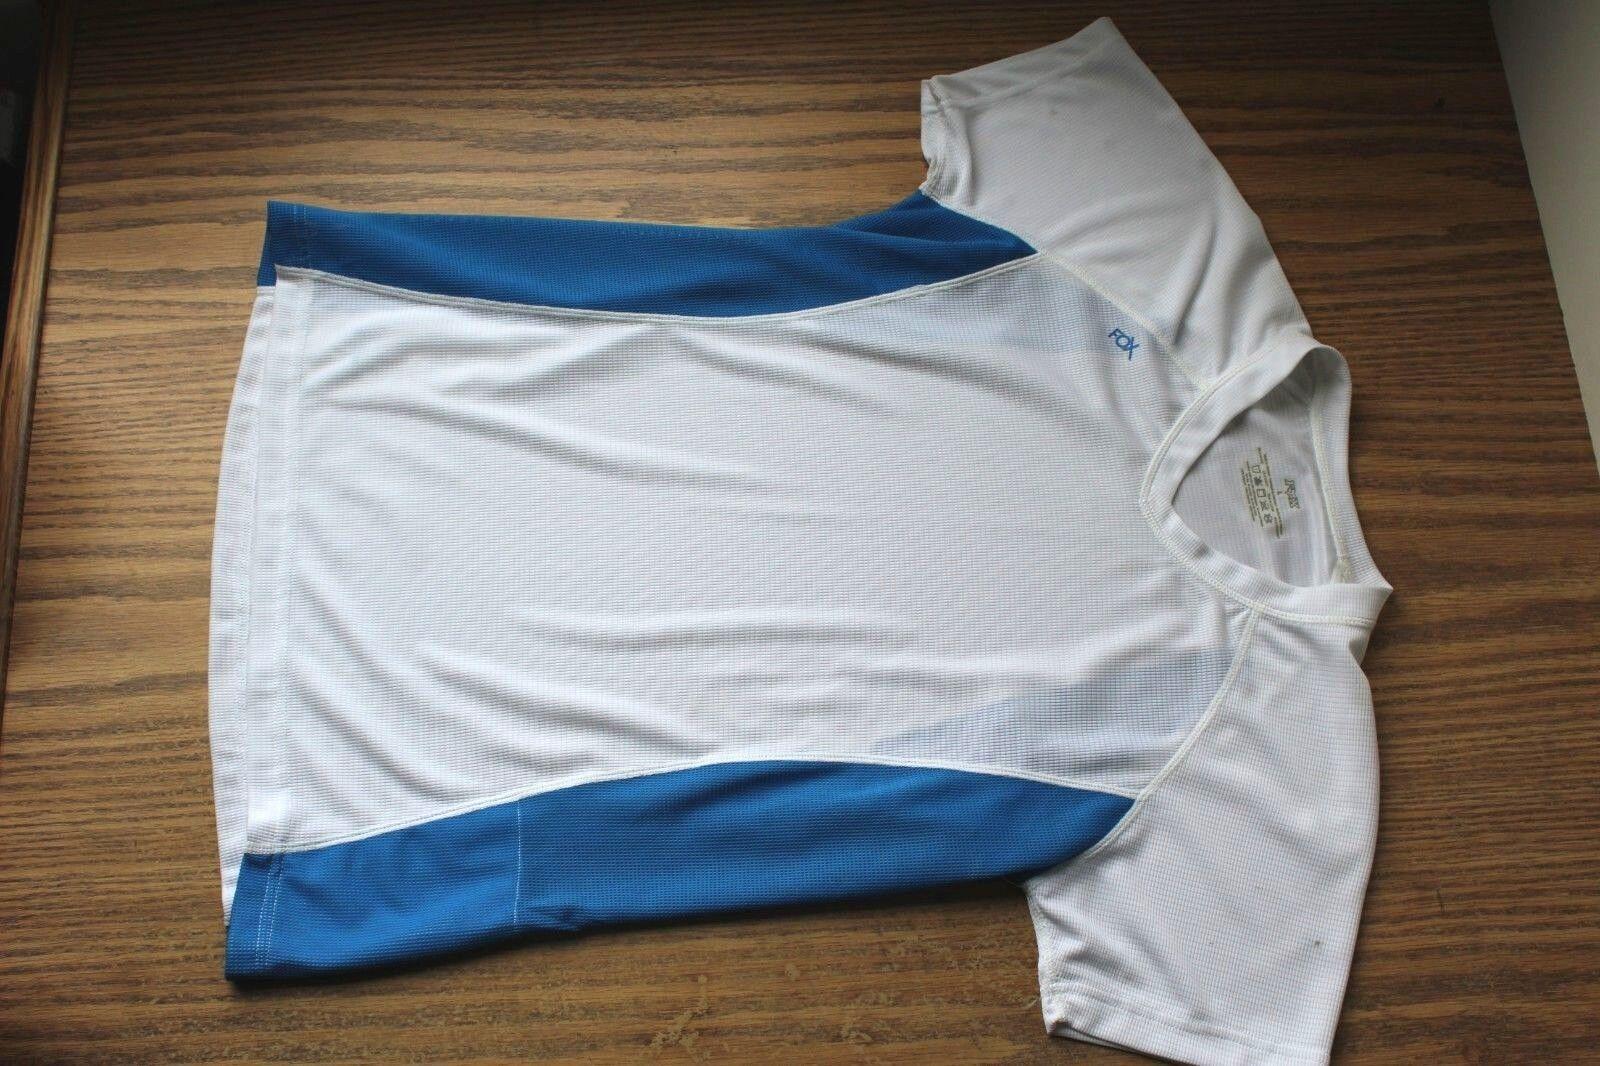 S Women's Fox Gaia Short Sleeve Jersey Small White bluee New NWT